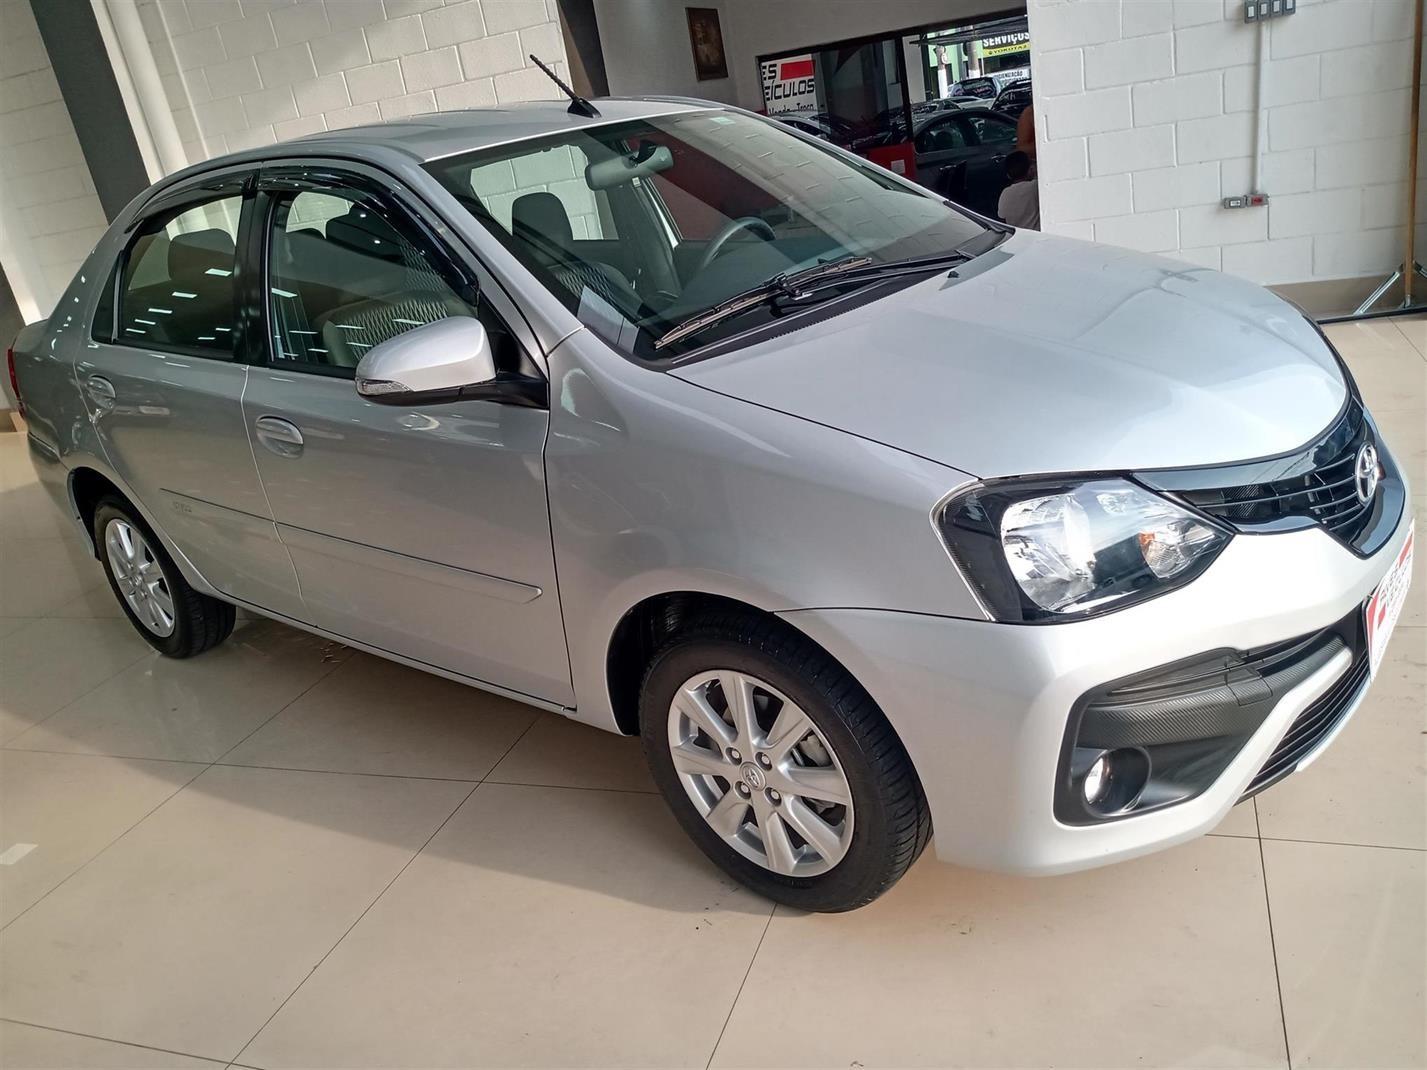 //www.autoline.com.br/carro/toyota/etios-15-x-plus-16v-sedan-flex-4p-automatico/2019/sao-paulo-sp/13353081